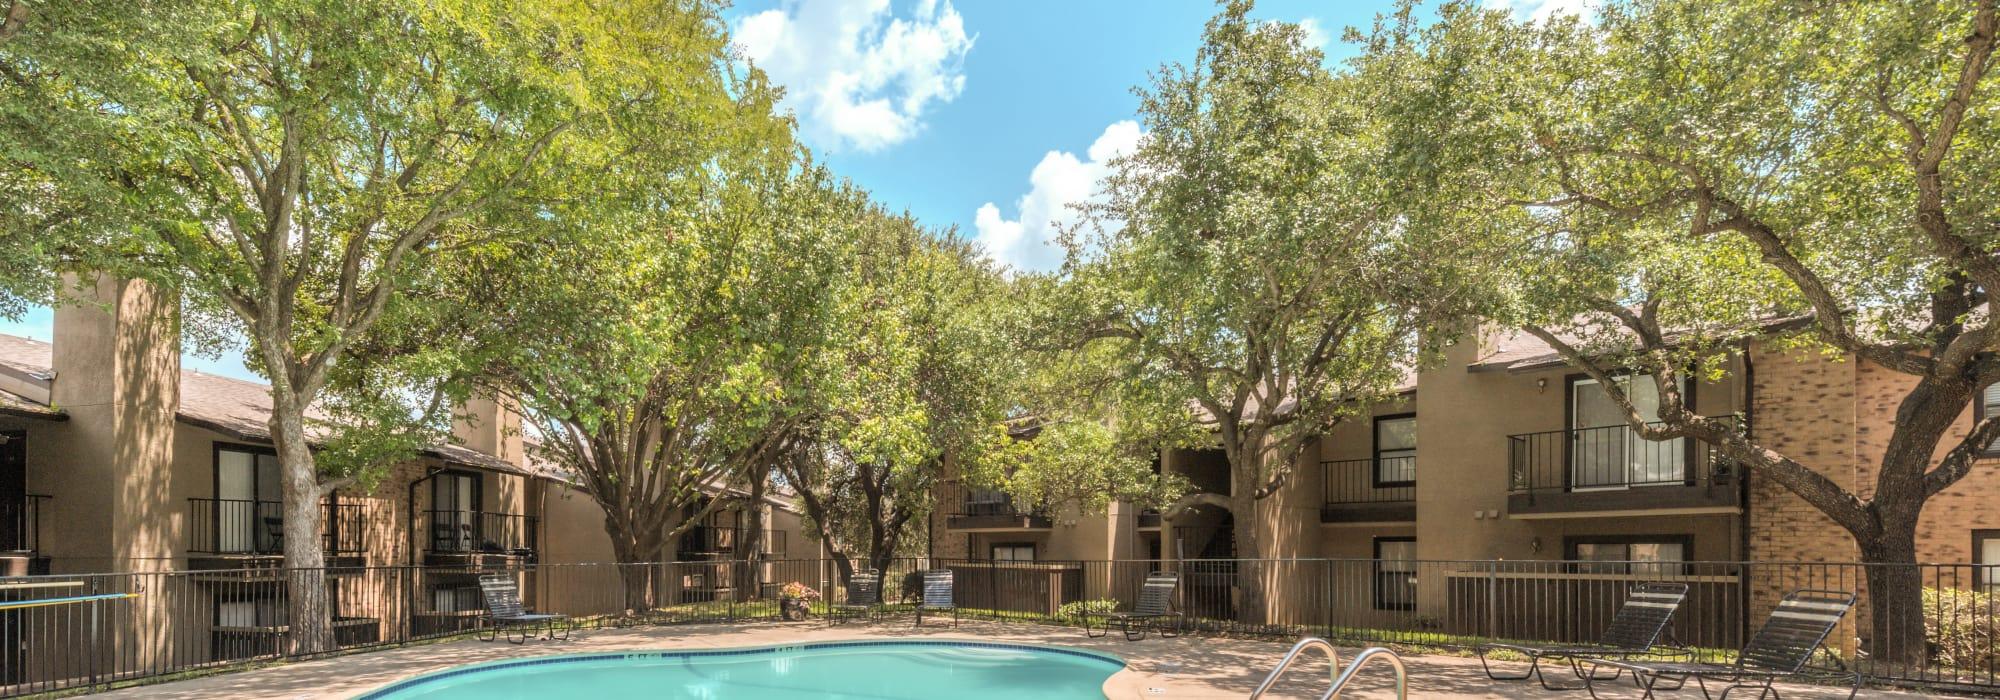 Apartments in DeSoto, TX